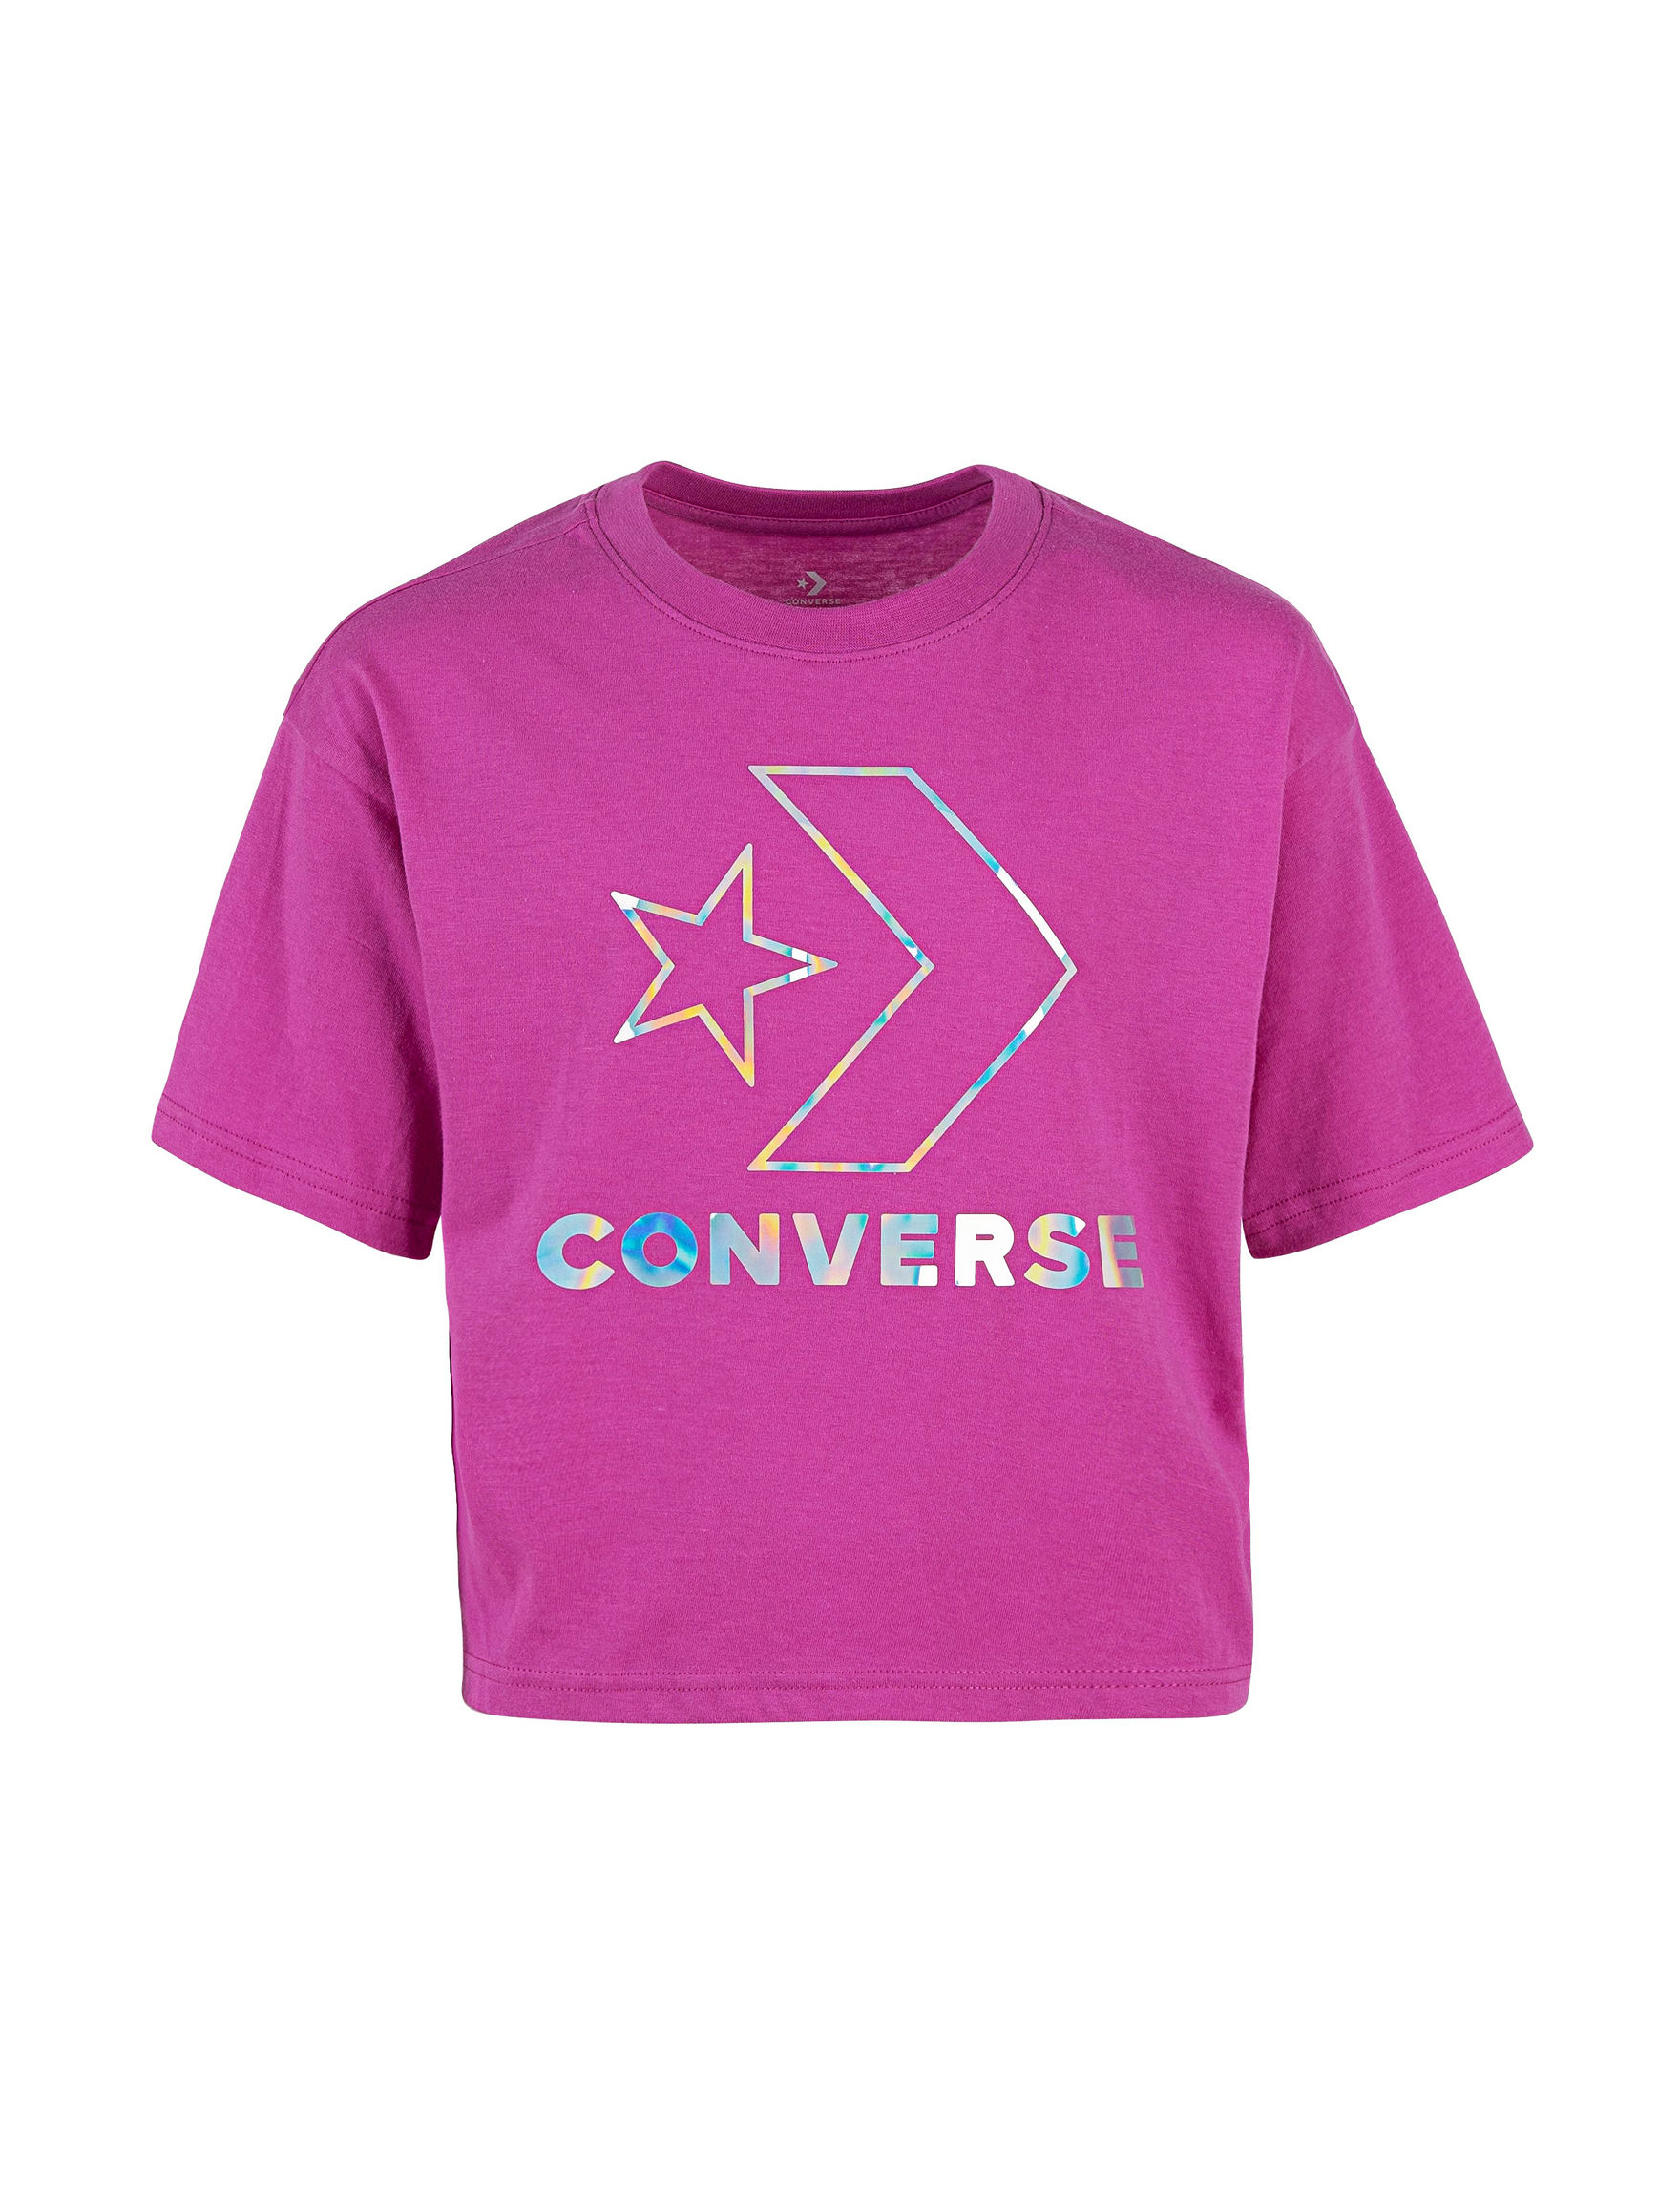 Converse Fuschia